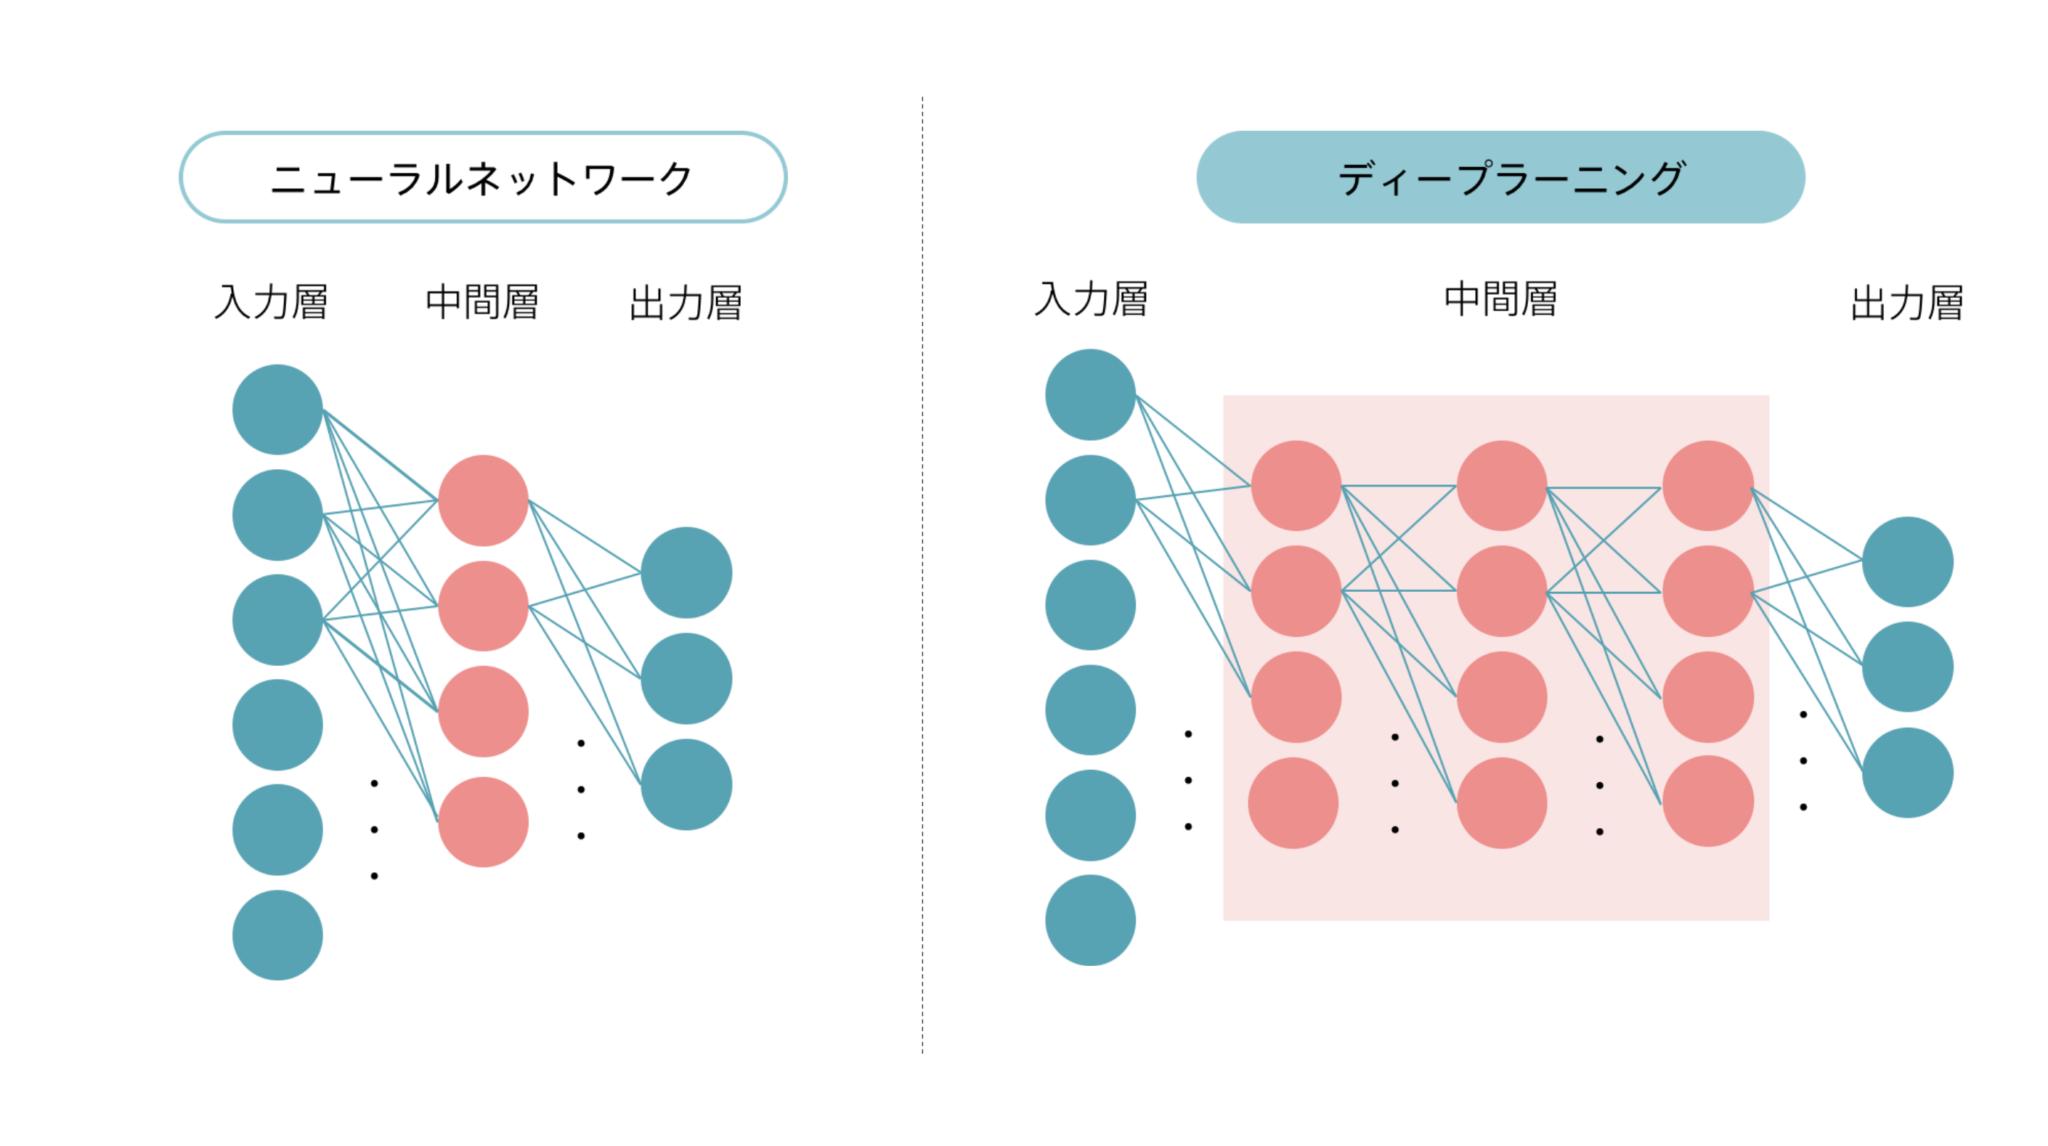 Deep Learningの簡単な仕組み